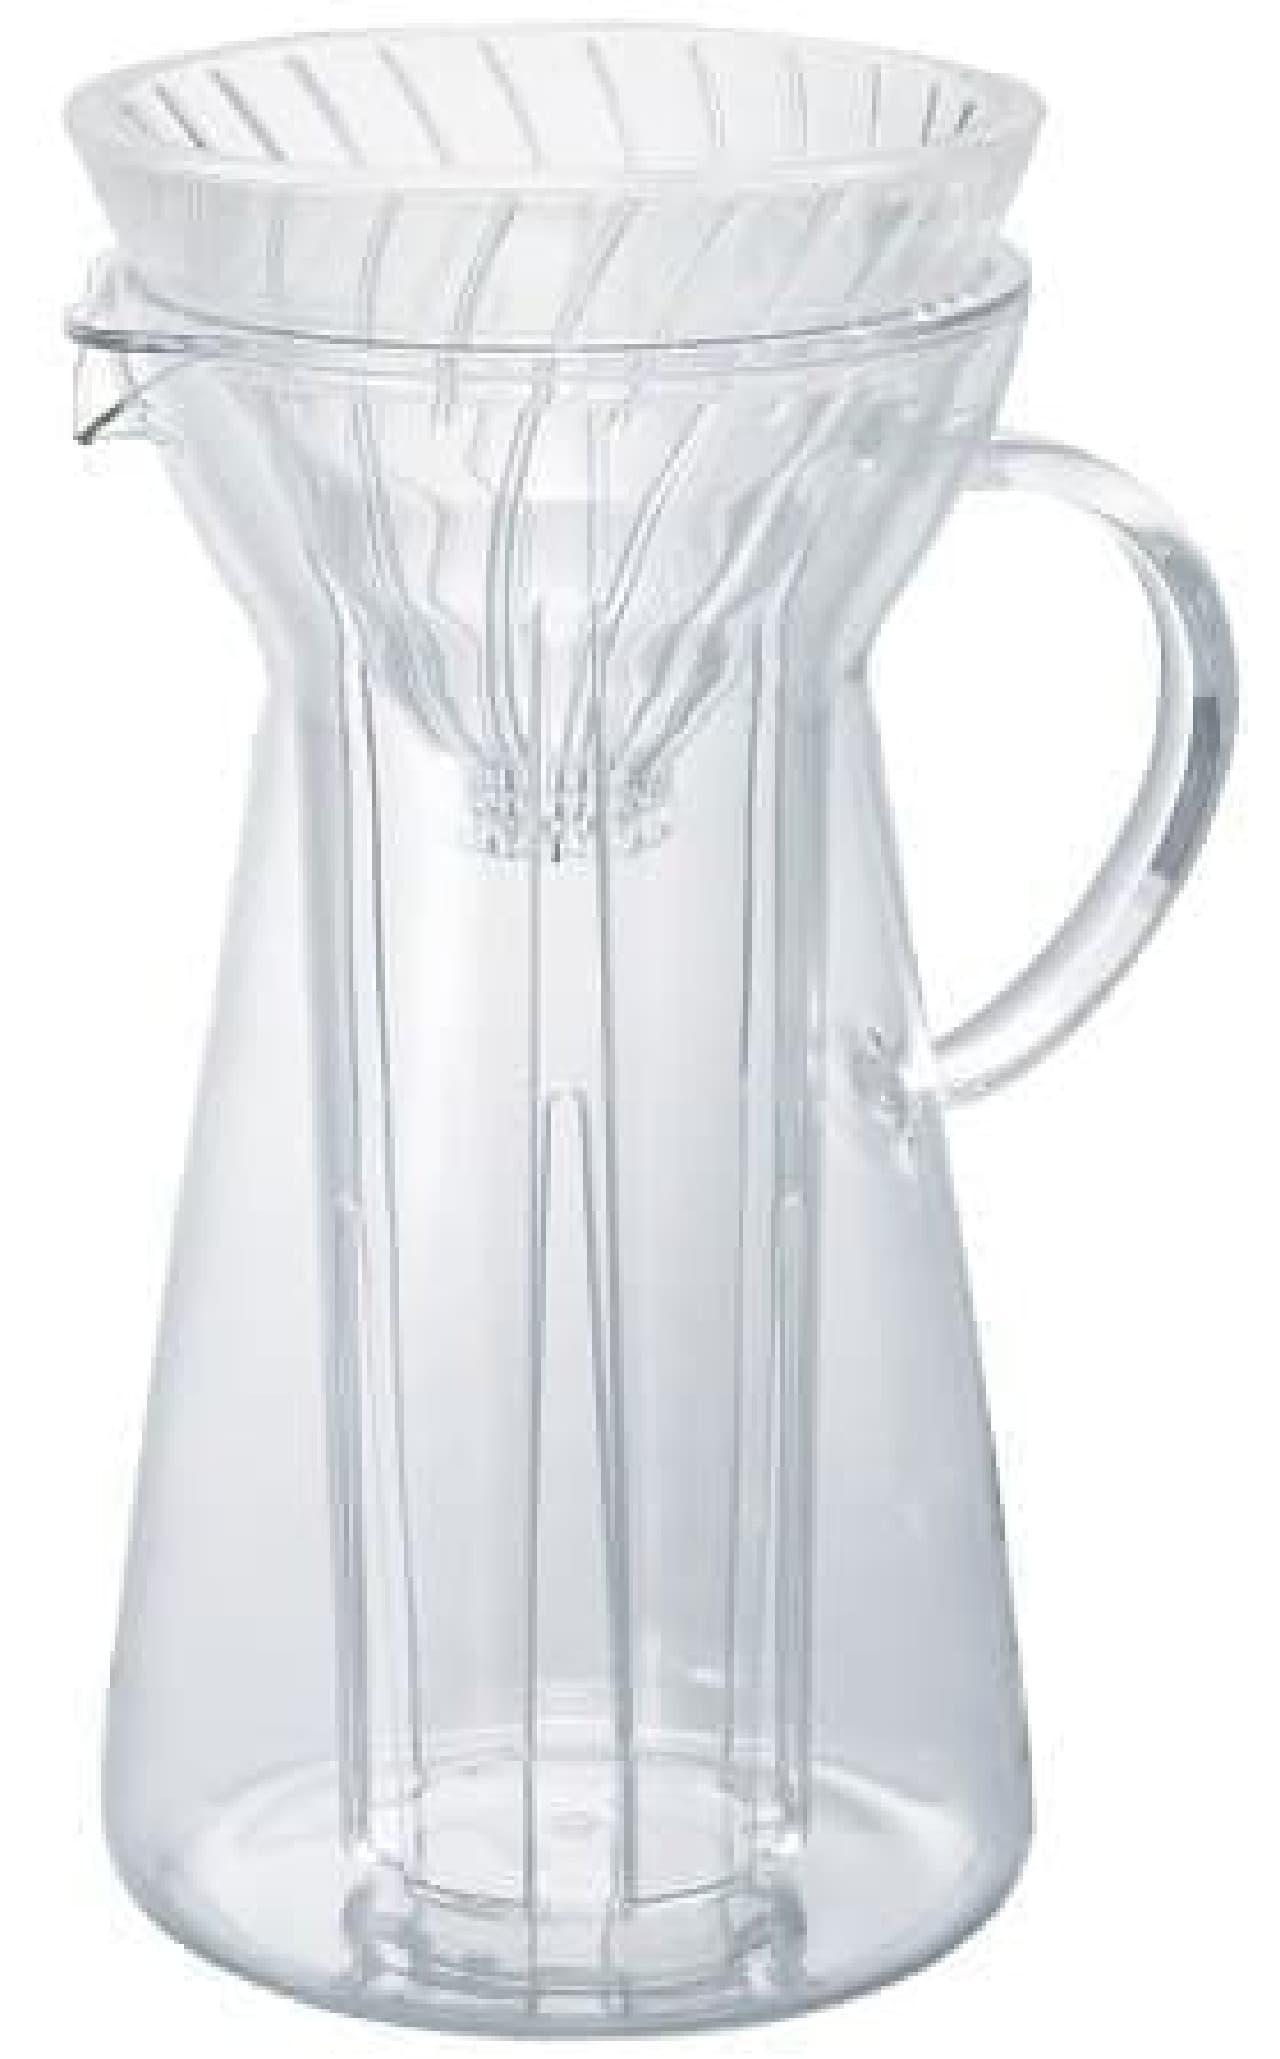 「V60 グラス アイスコーヒーメーカー」